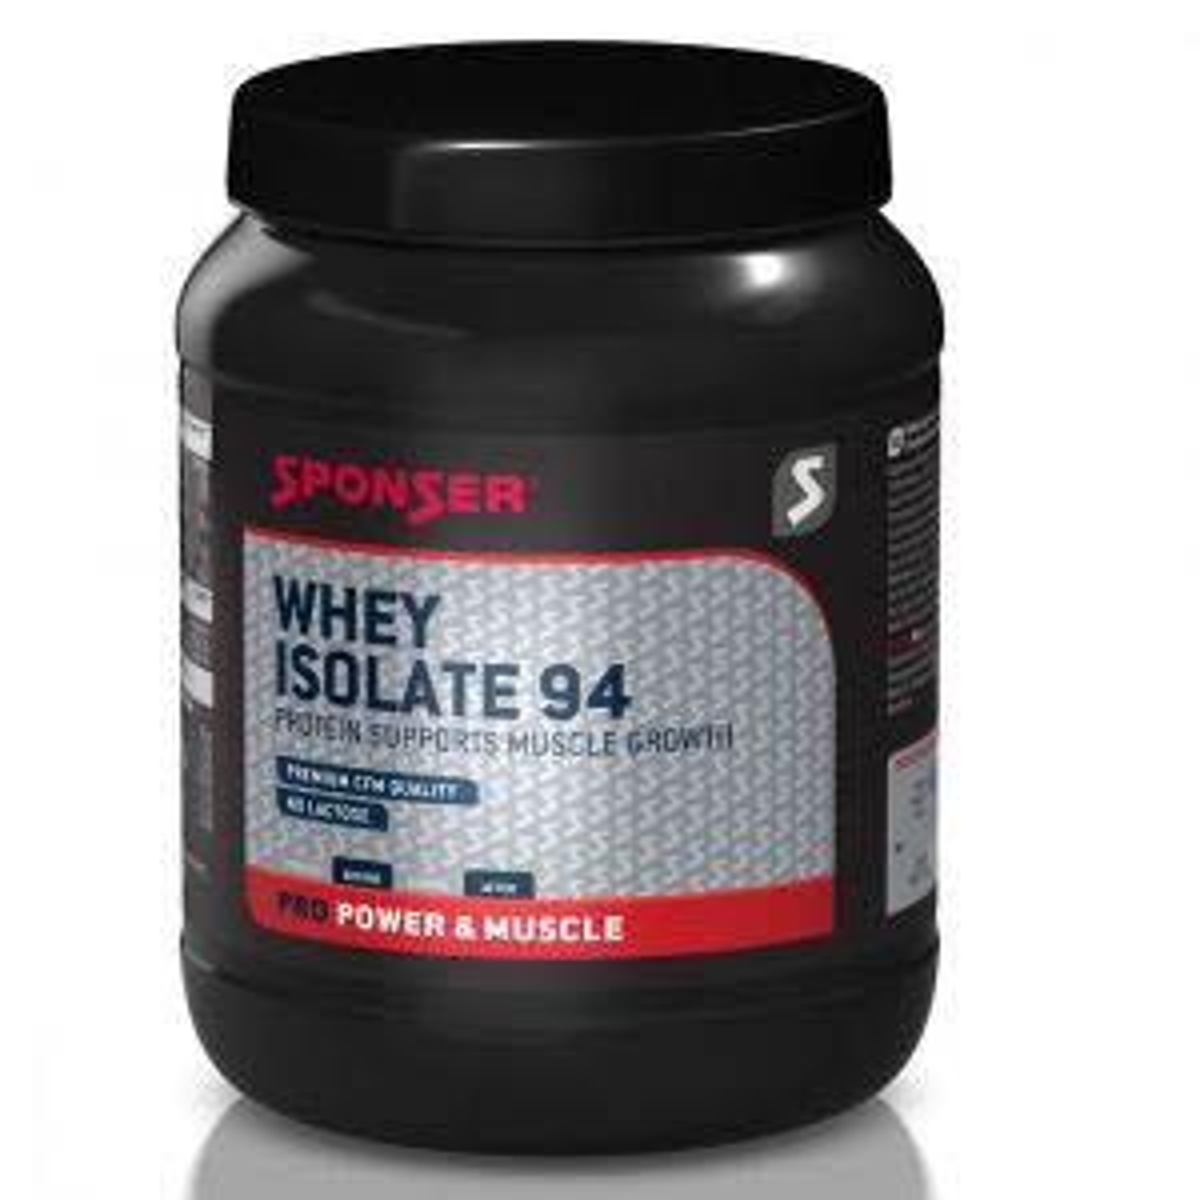 Whey Isolate 94 Molkenproteinisolat Eiweißpulver 1500g Banane- Mindesthaltbarkeitsdatum 06/2022